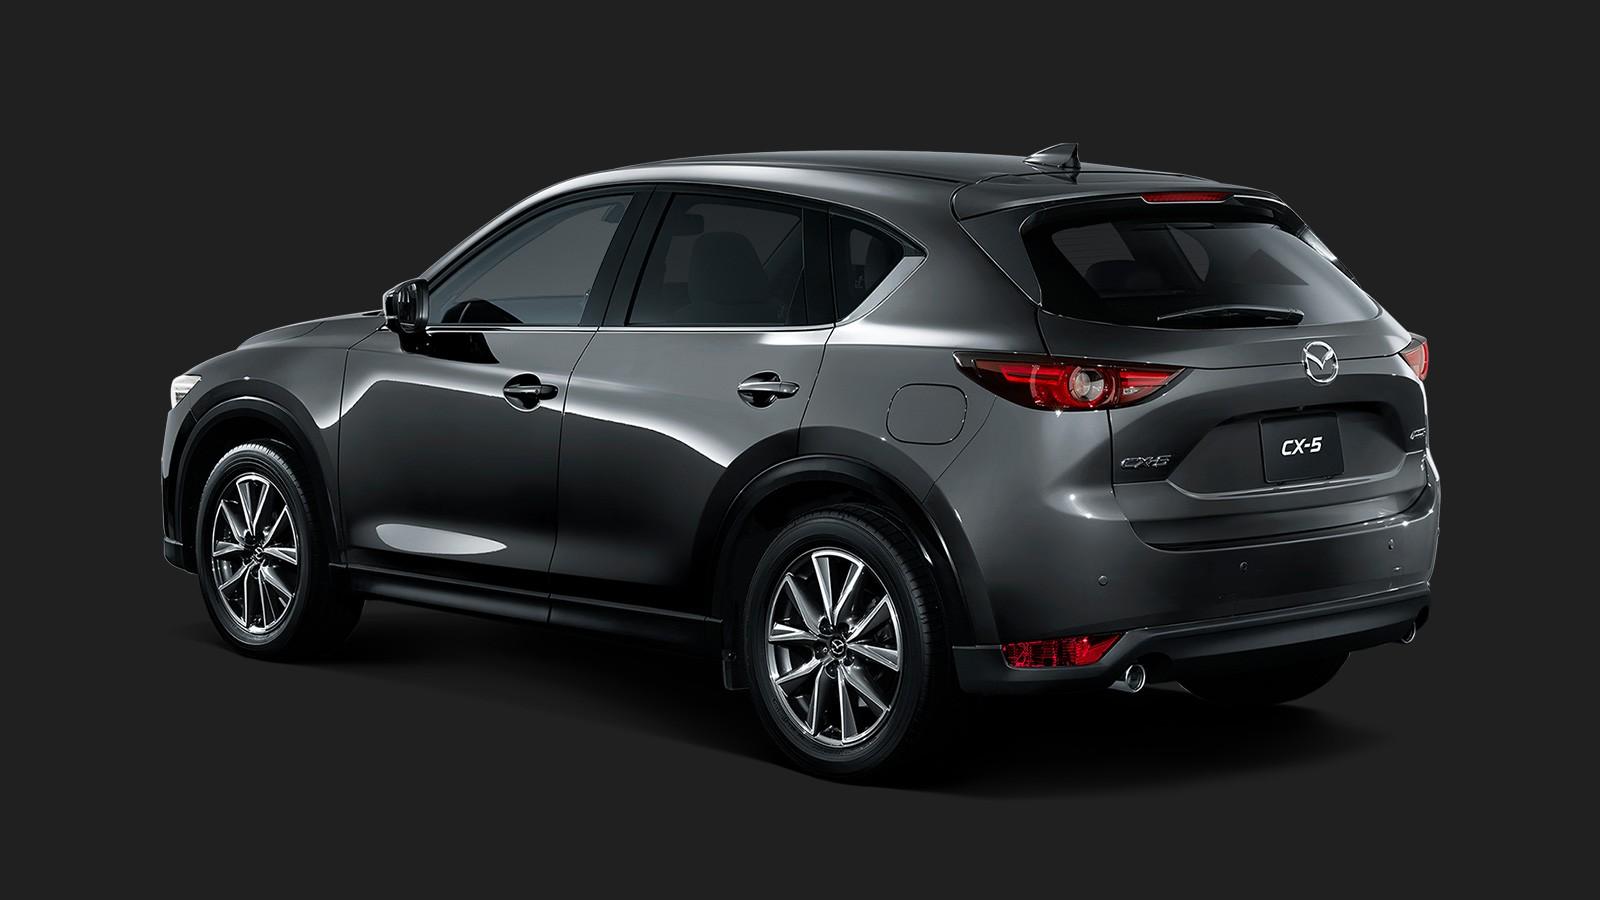 2017 Mazda CX-5 Getting 7-Seat Version in Japan - autoevolution